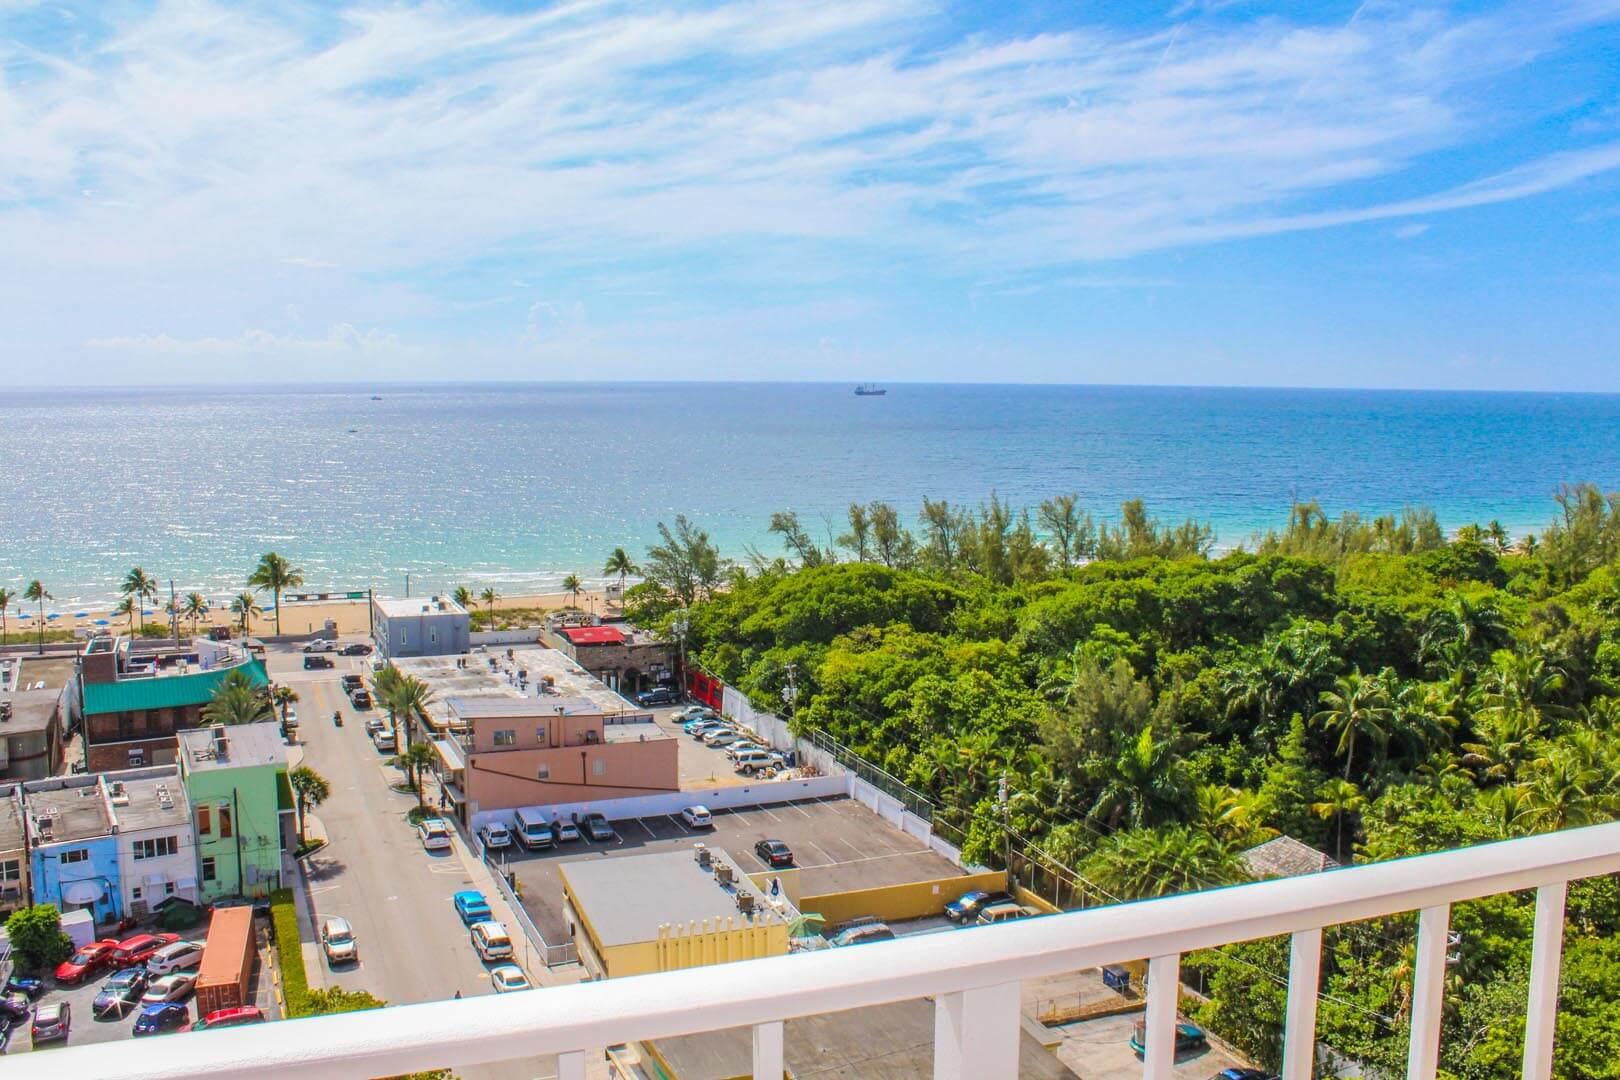 Ft Lauderdale Beach Resort Club Balcony View